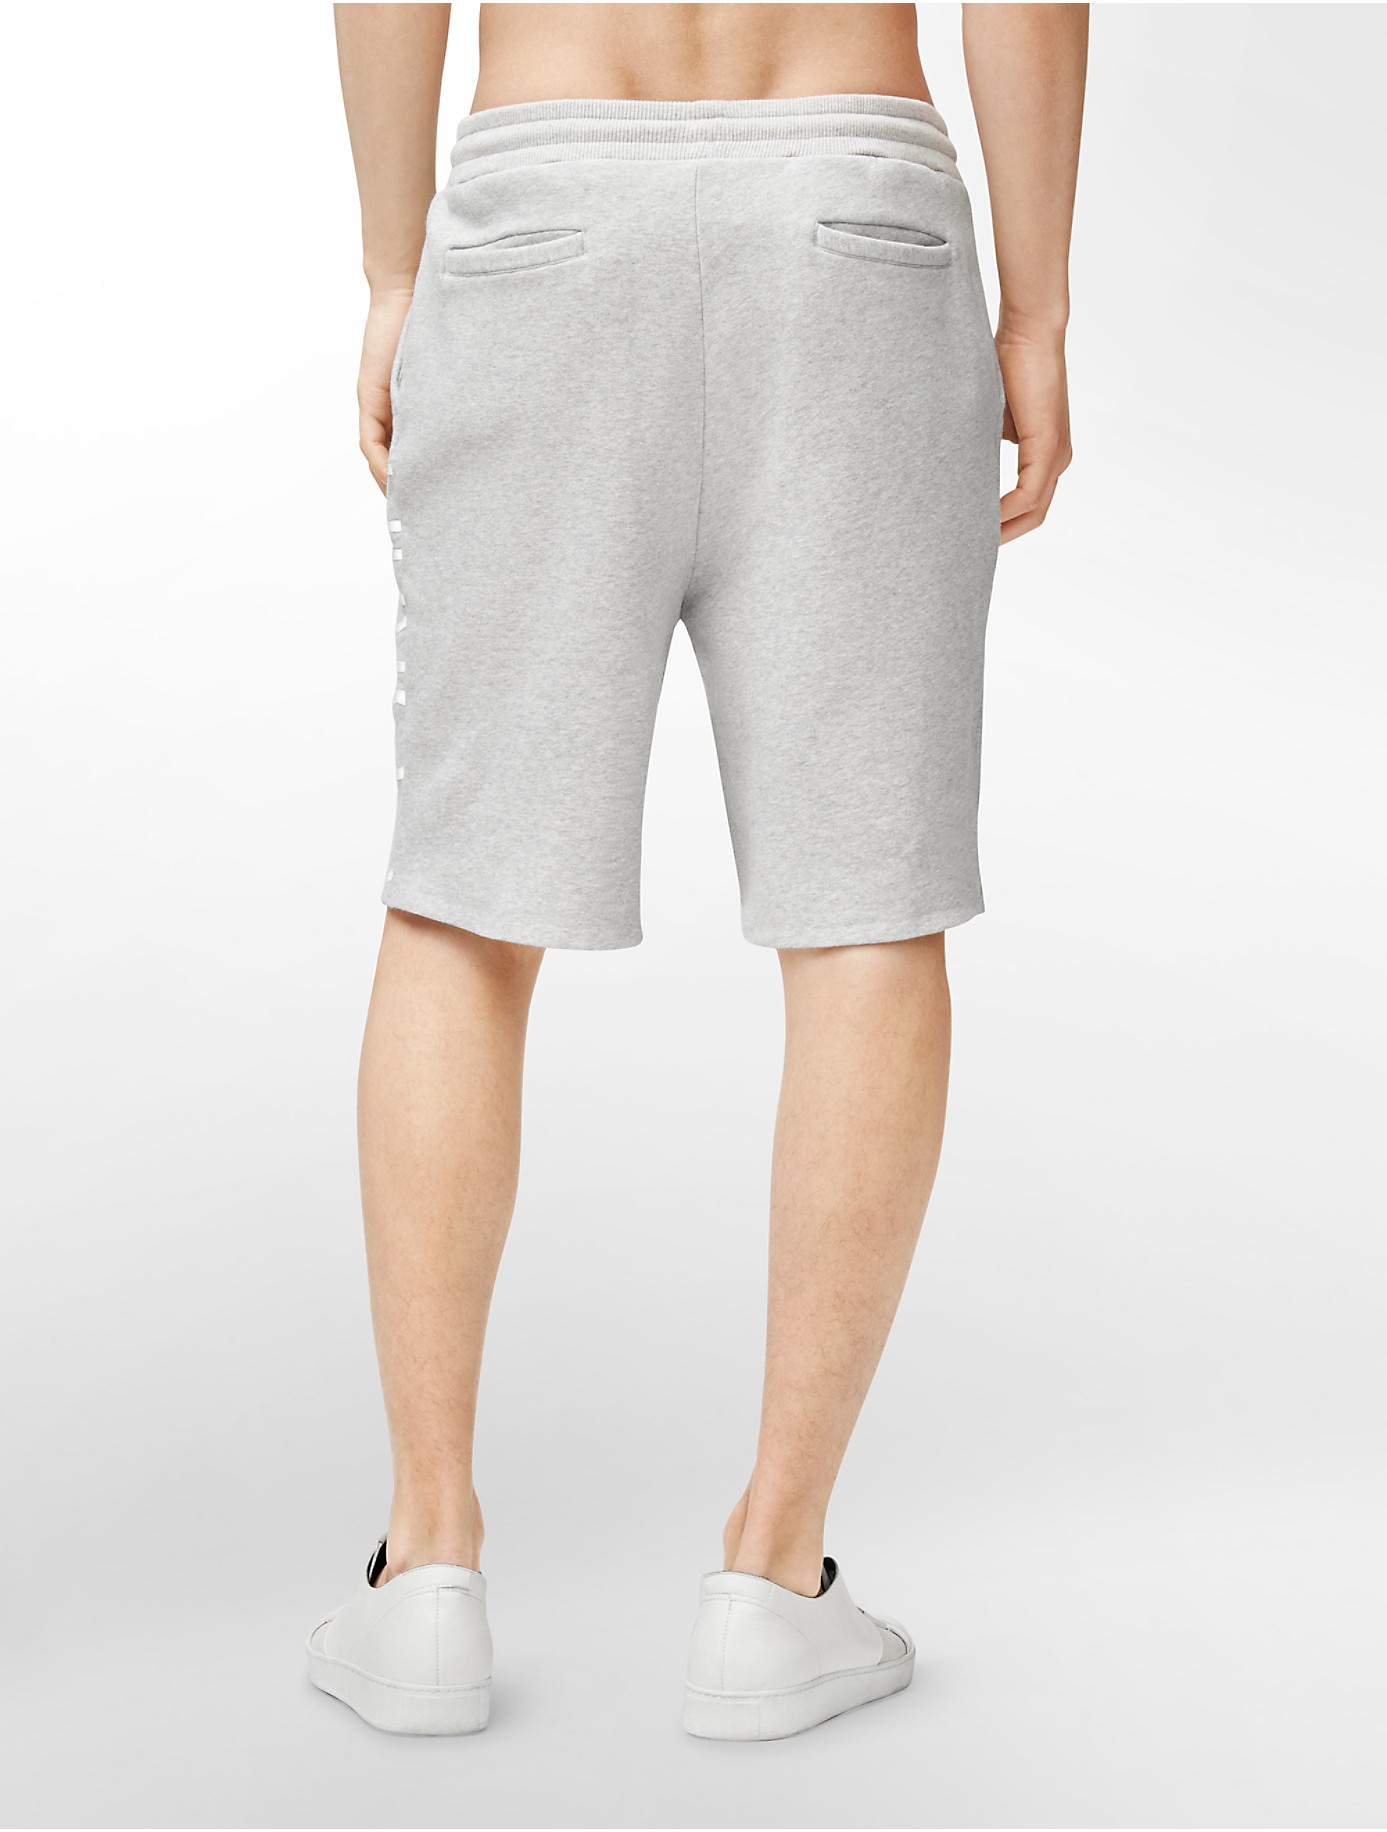 For Jeans Jogger Men Klein Sweatshort Logo Gray In Calvin Lyst 8wCxqEIgc